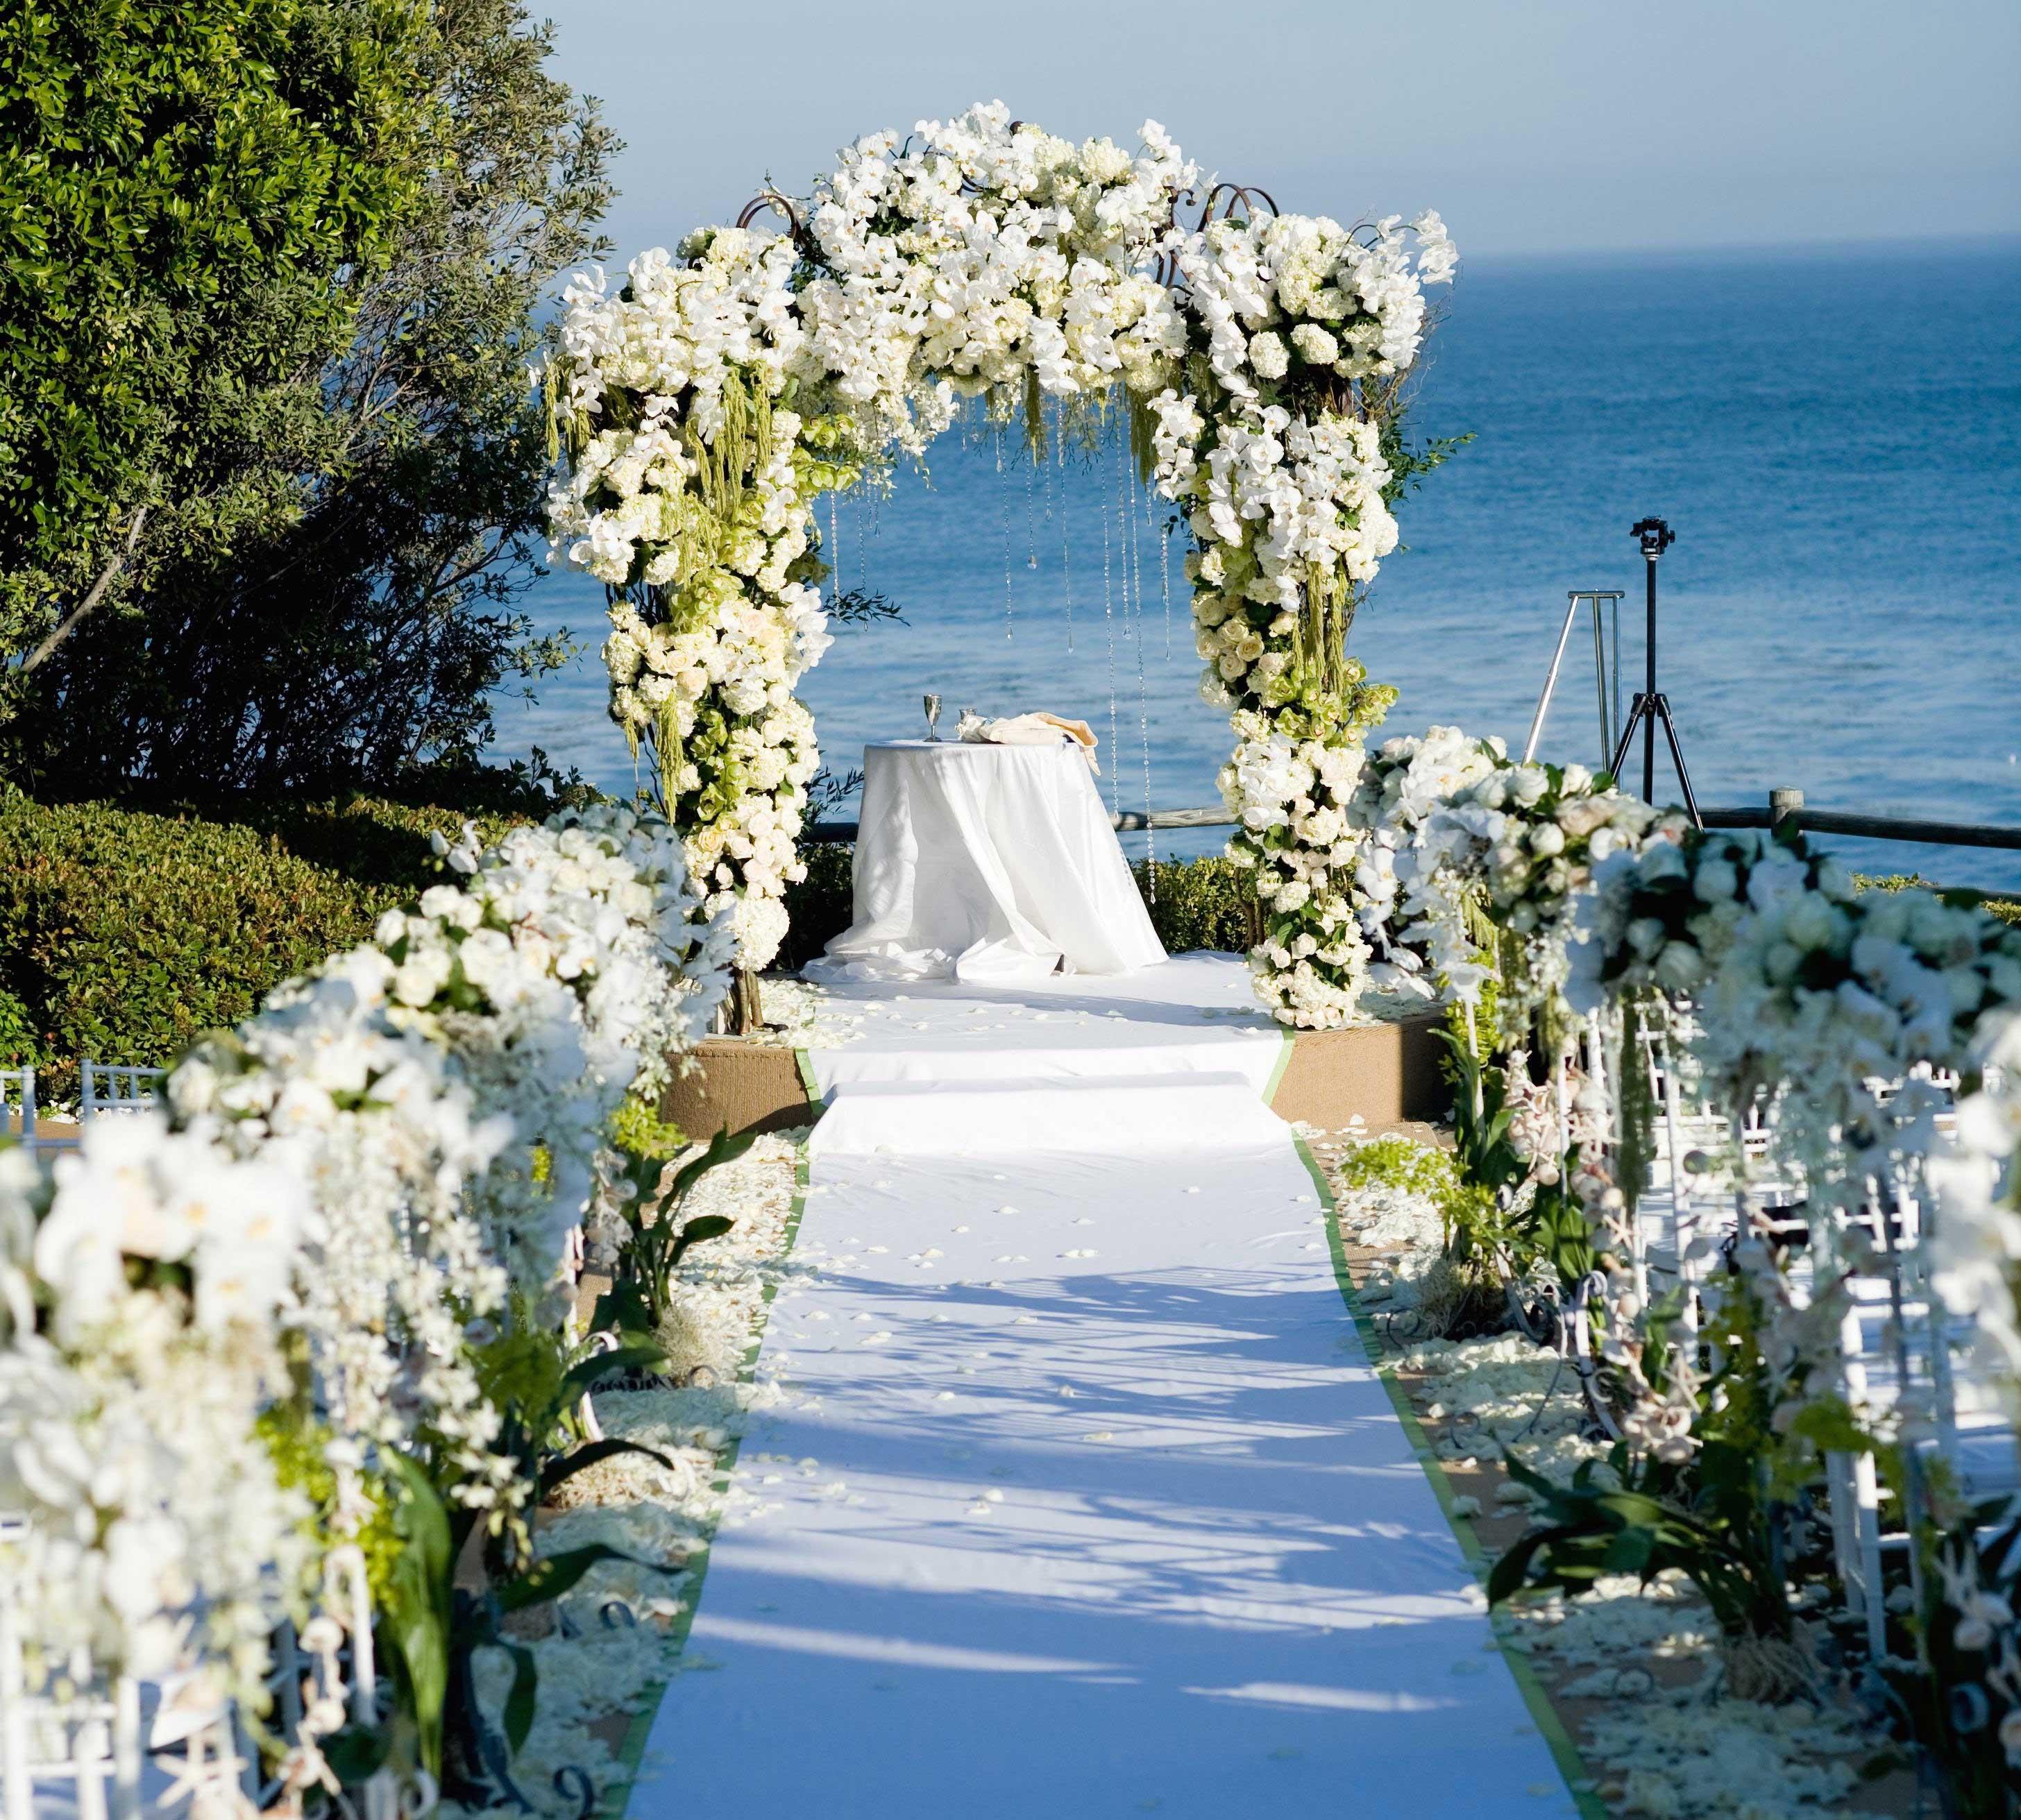 Beach wedding ceremony with flower arch